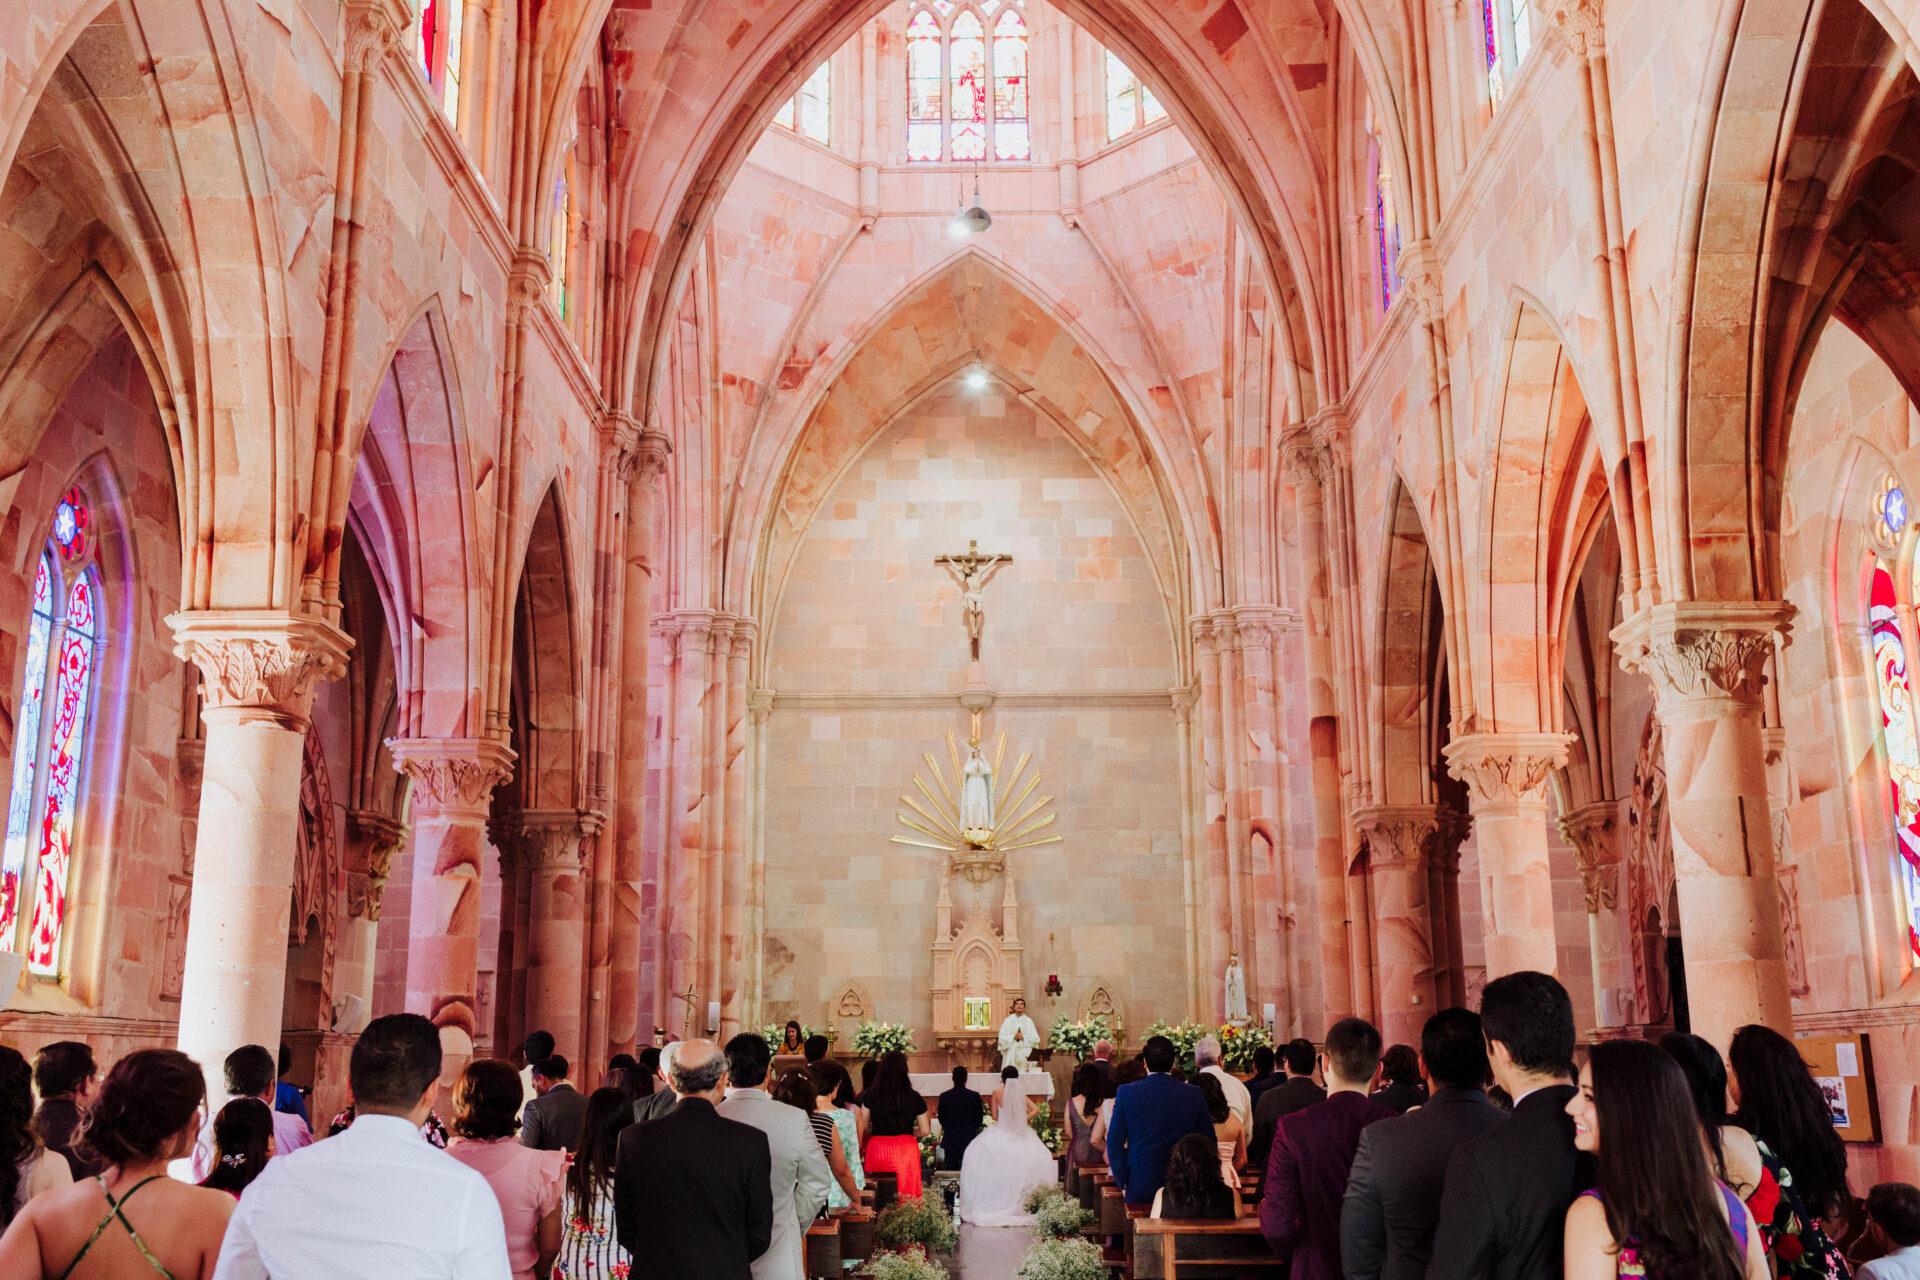 javier_noriega_fotografo_bodas_exhacienda_las_mercedes_zacatecas_wedding_photographer4a